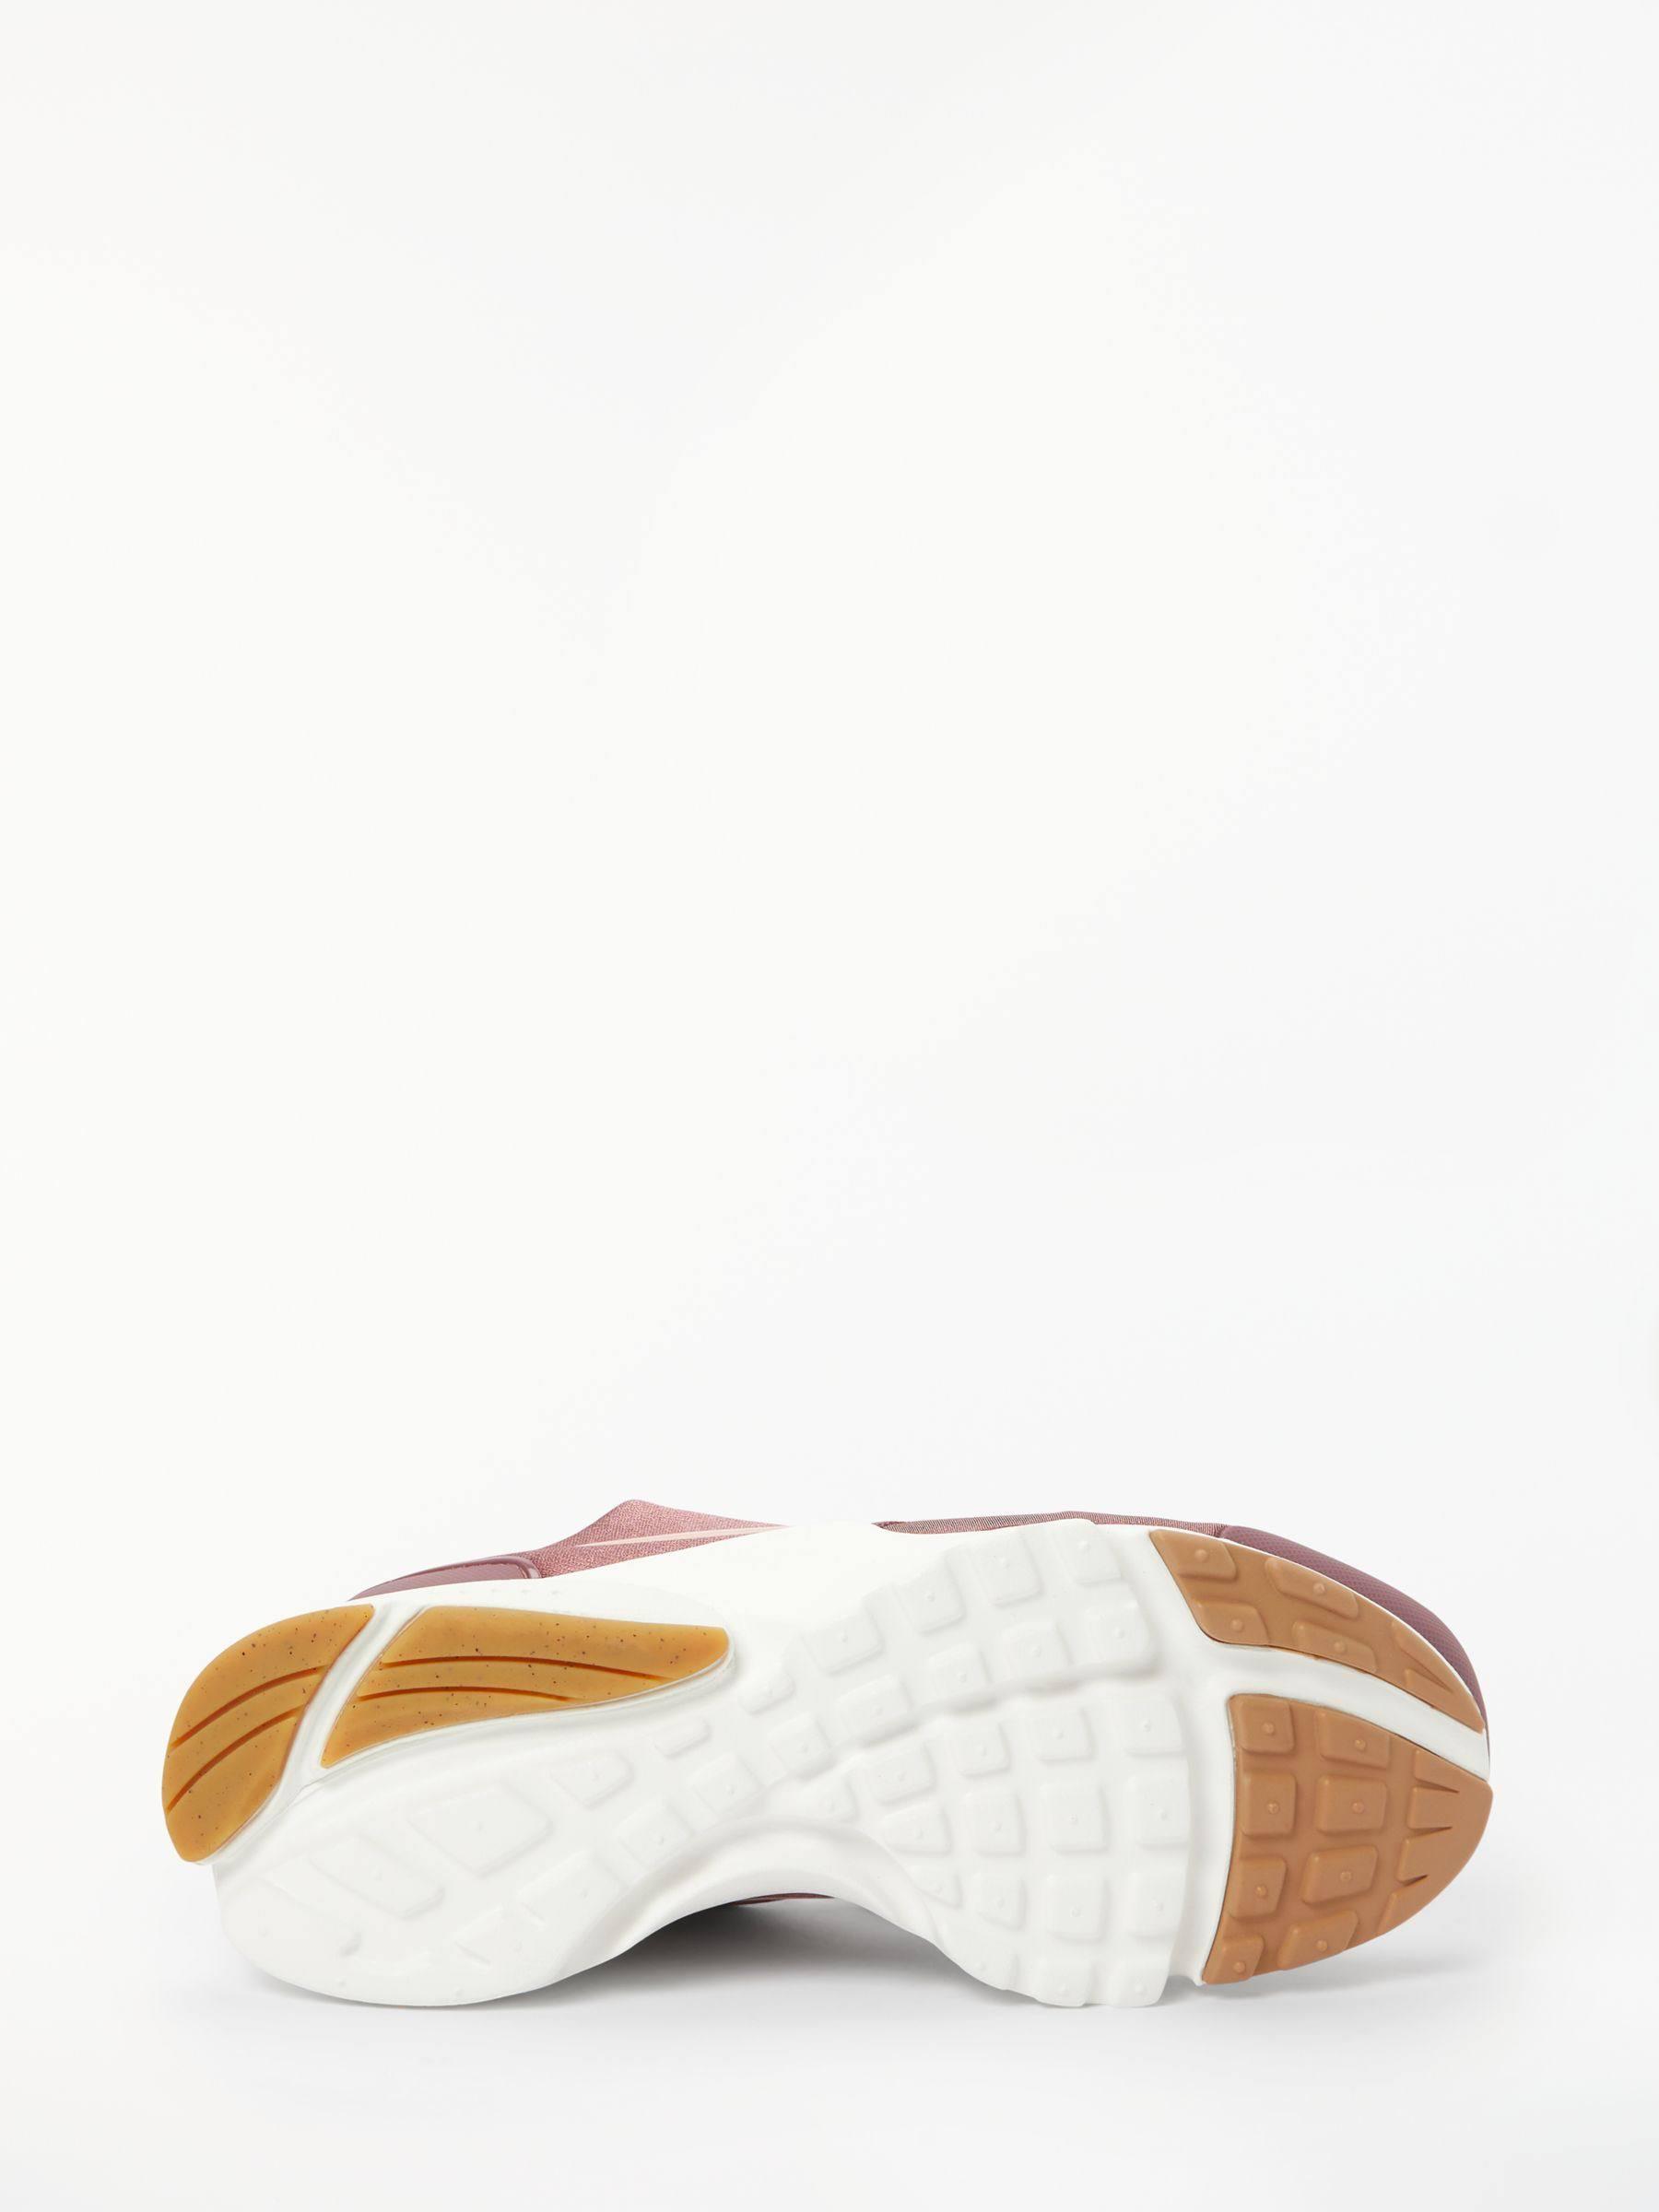 Mauve Nike white Size Women 8 Presto white Mauve Fly Mauve qSSnUHTwaE